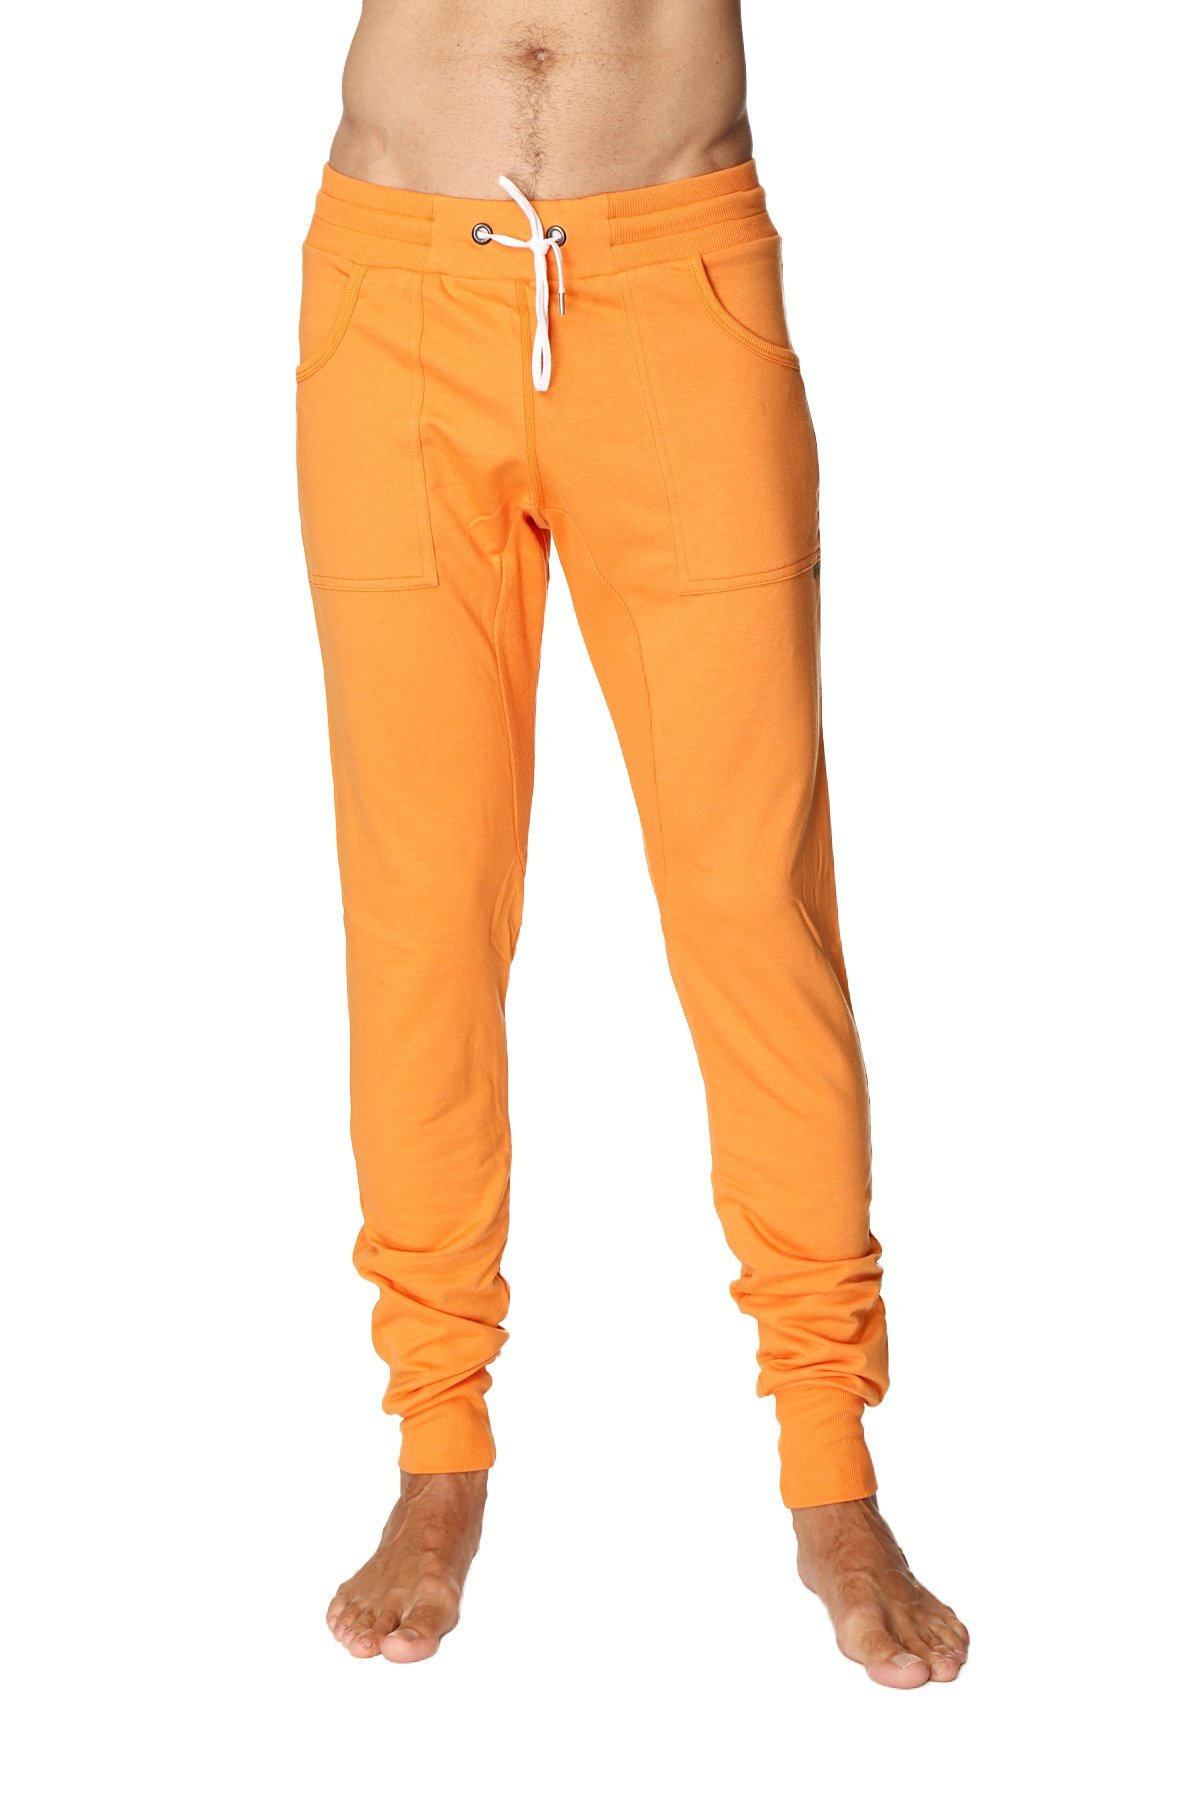 4-rth Men's Long Cuffed Perfection Yoga Pant (Medium, Sun Orange) by 4-rth